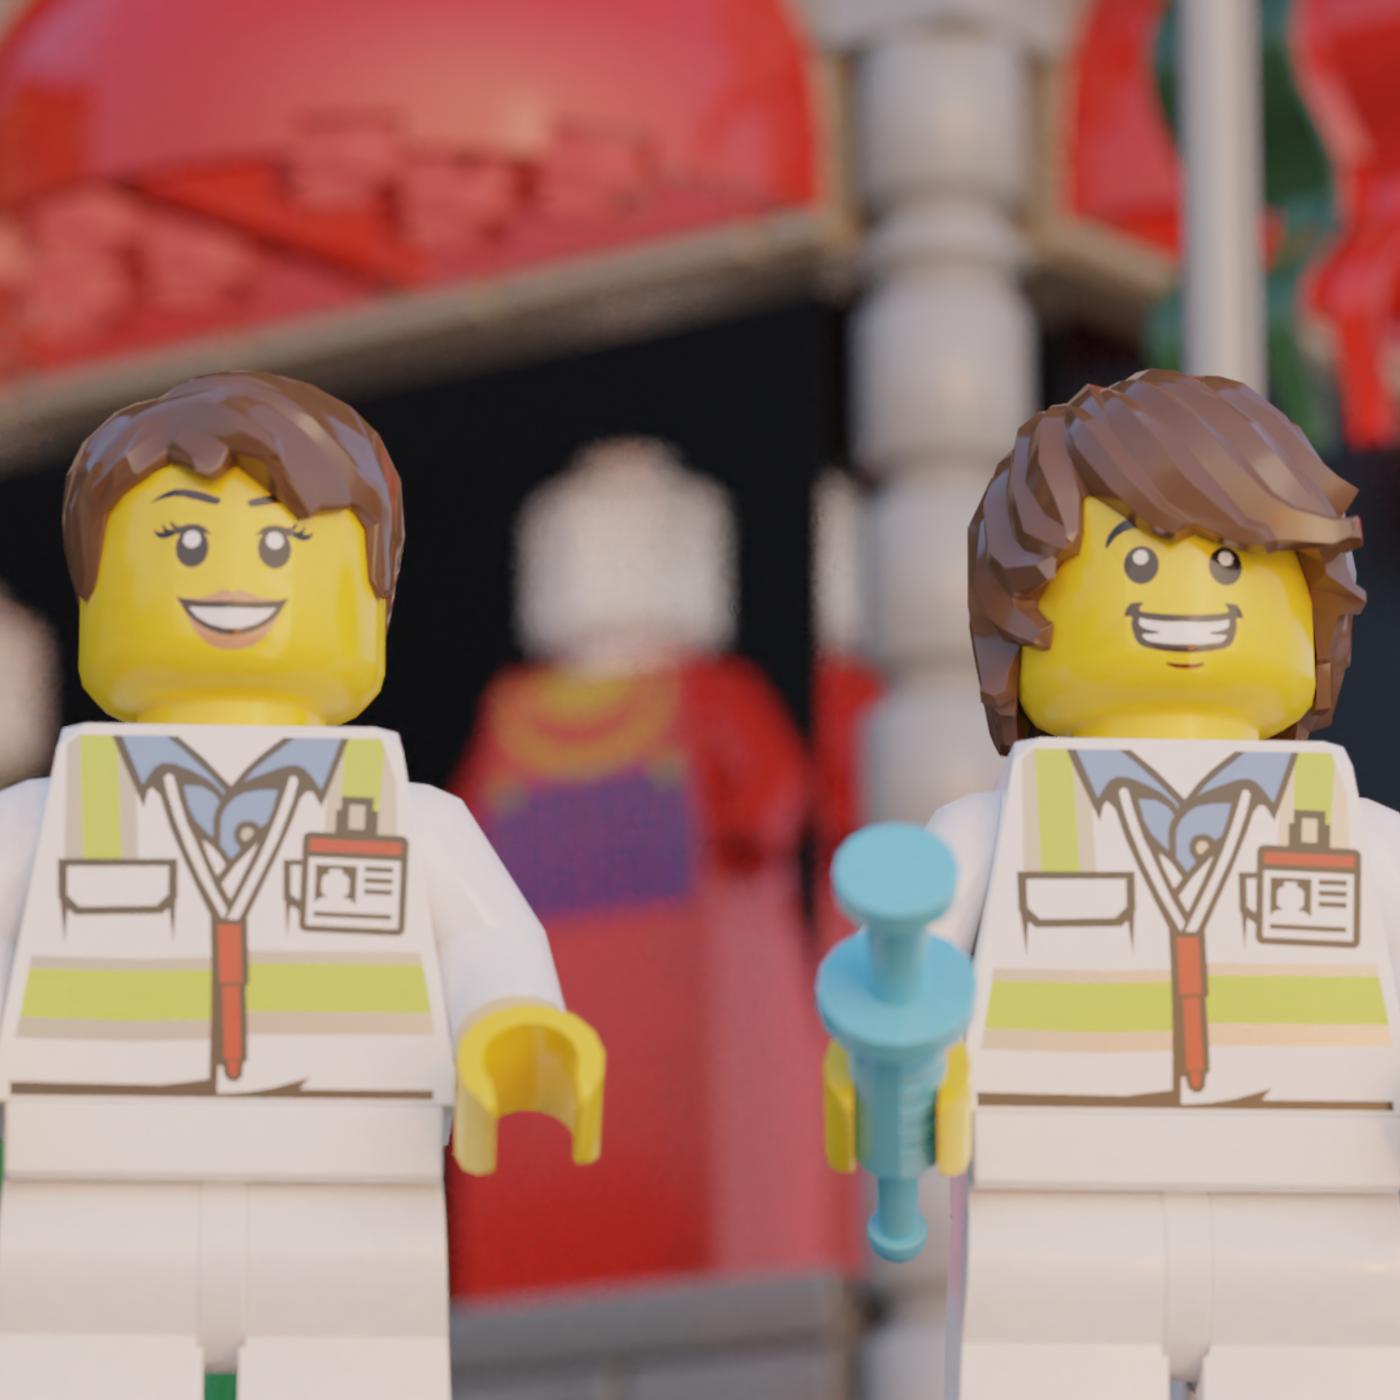 Lego doctors